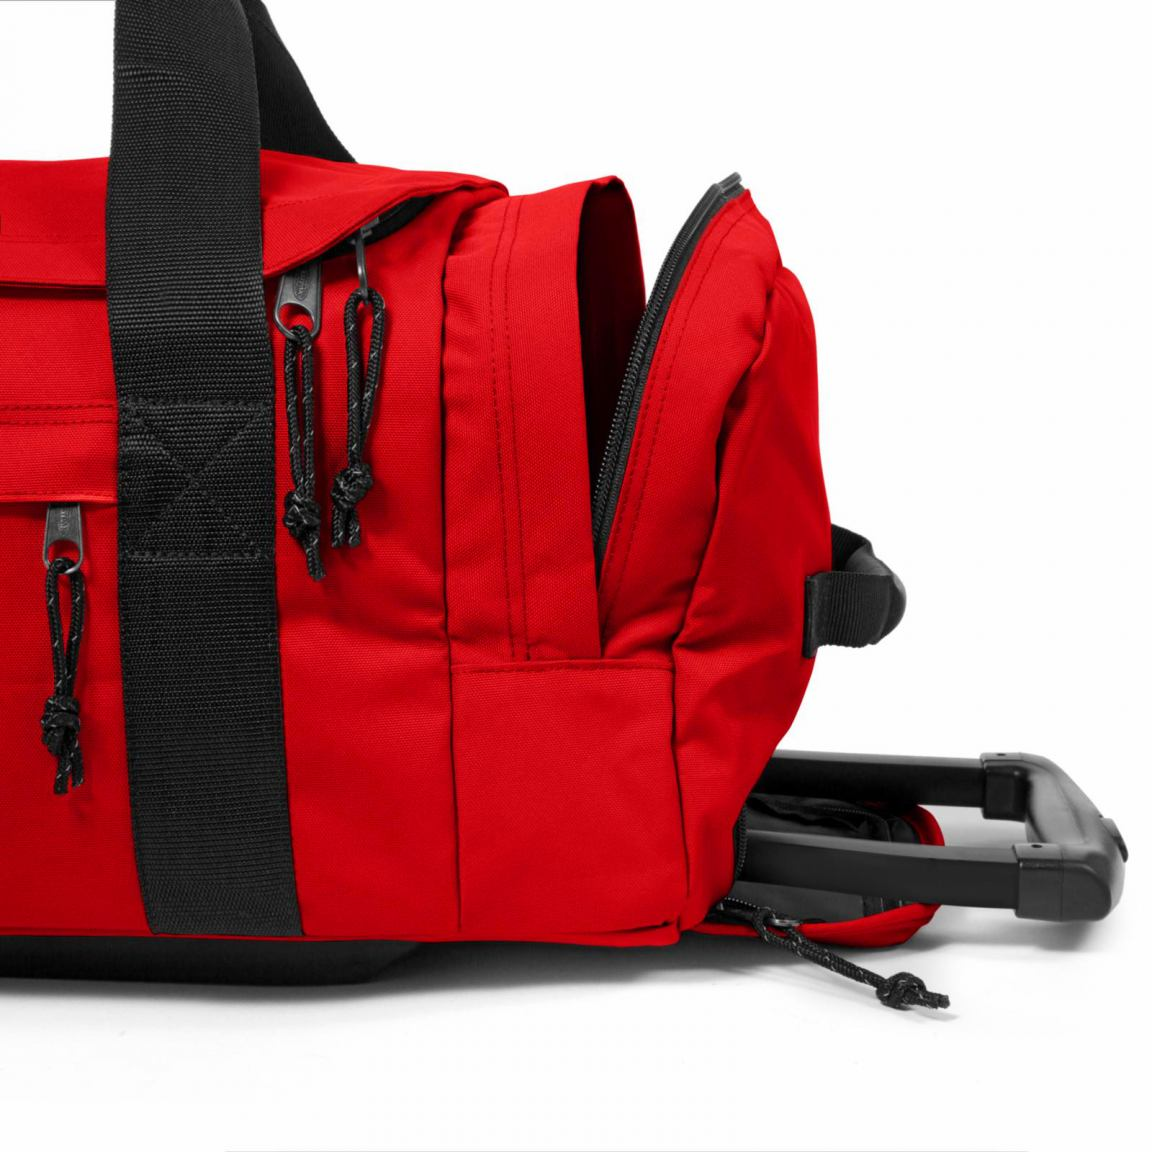 9525e19aa0722 Eastpak Leatherface S Reisetrolley Bush Khaki dunkelgrün - Bags   more